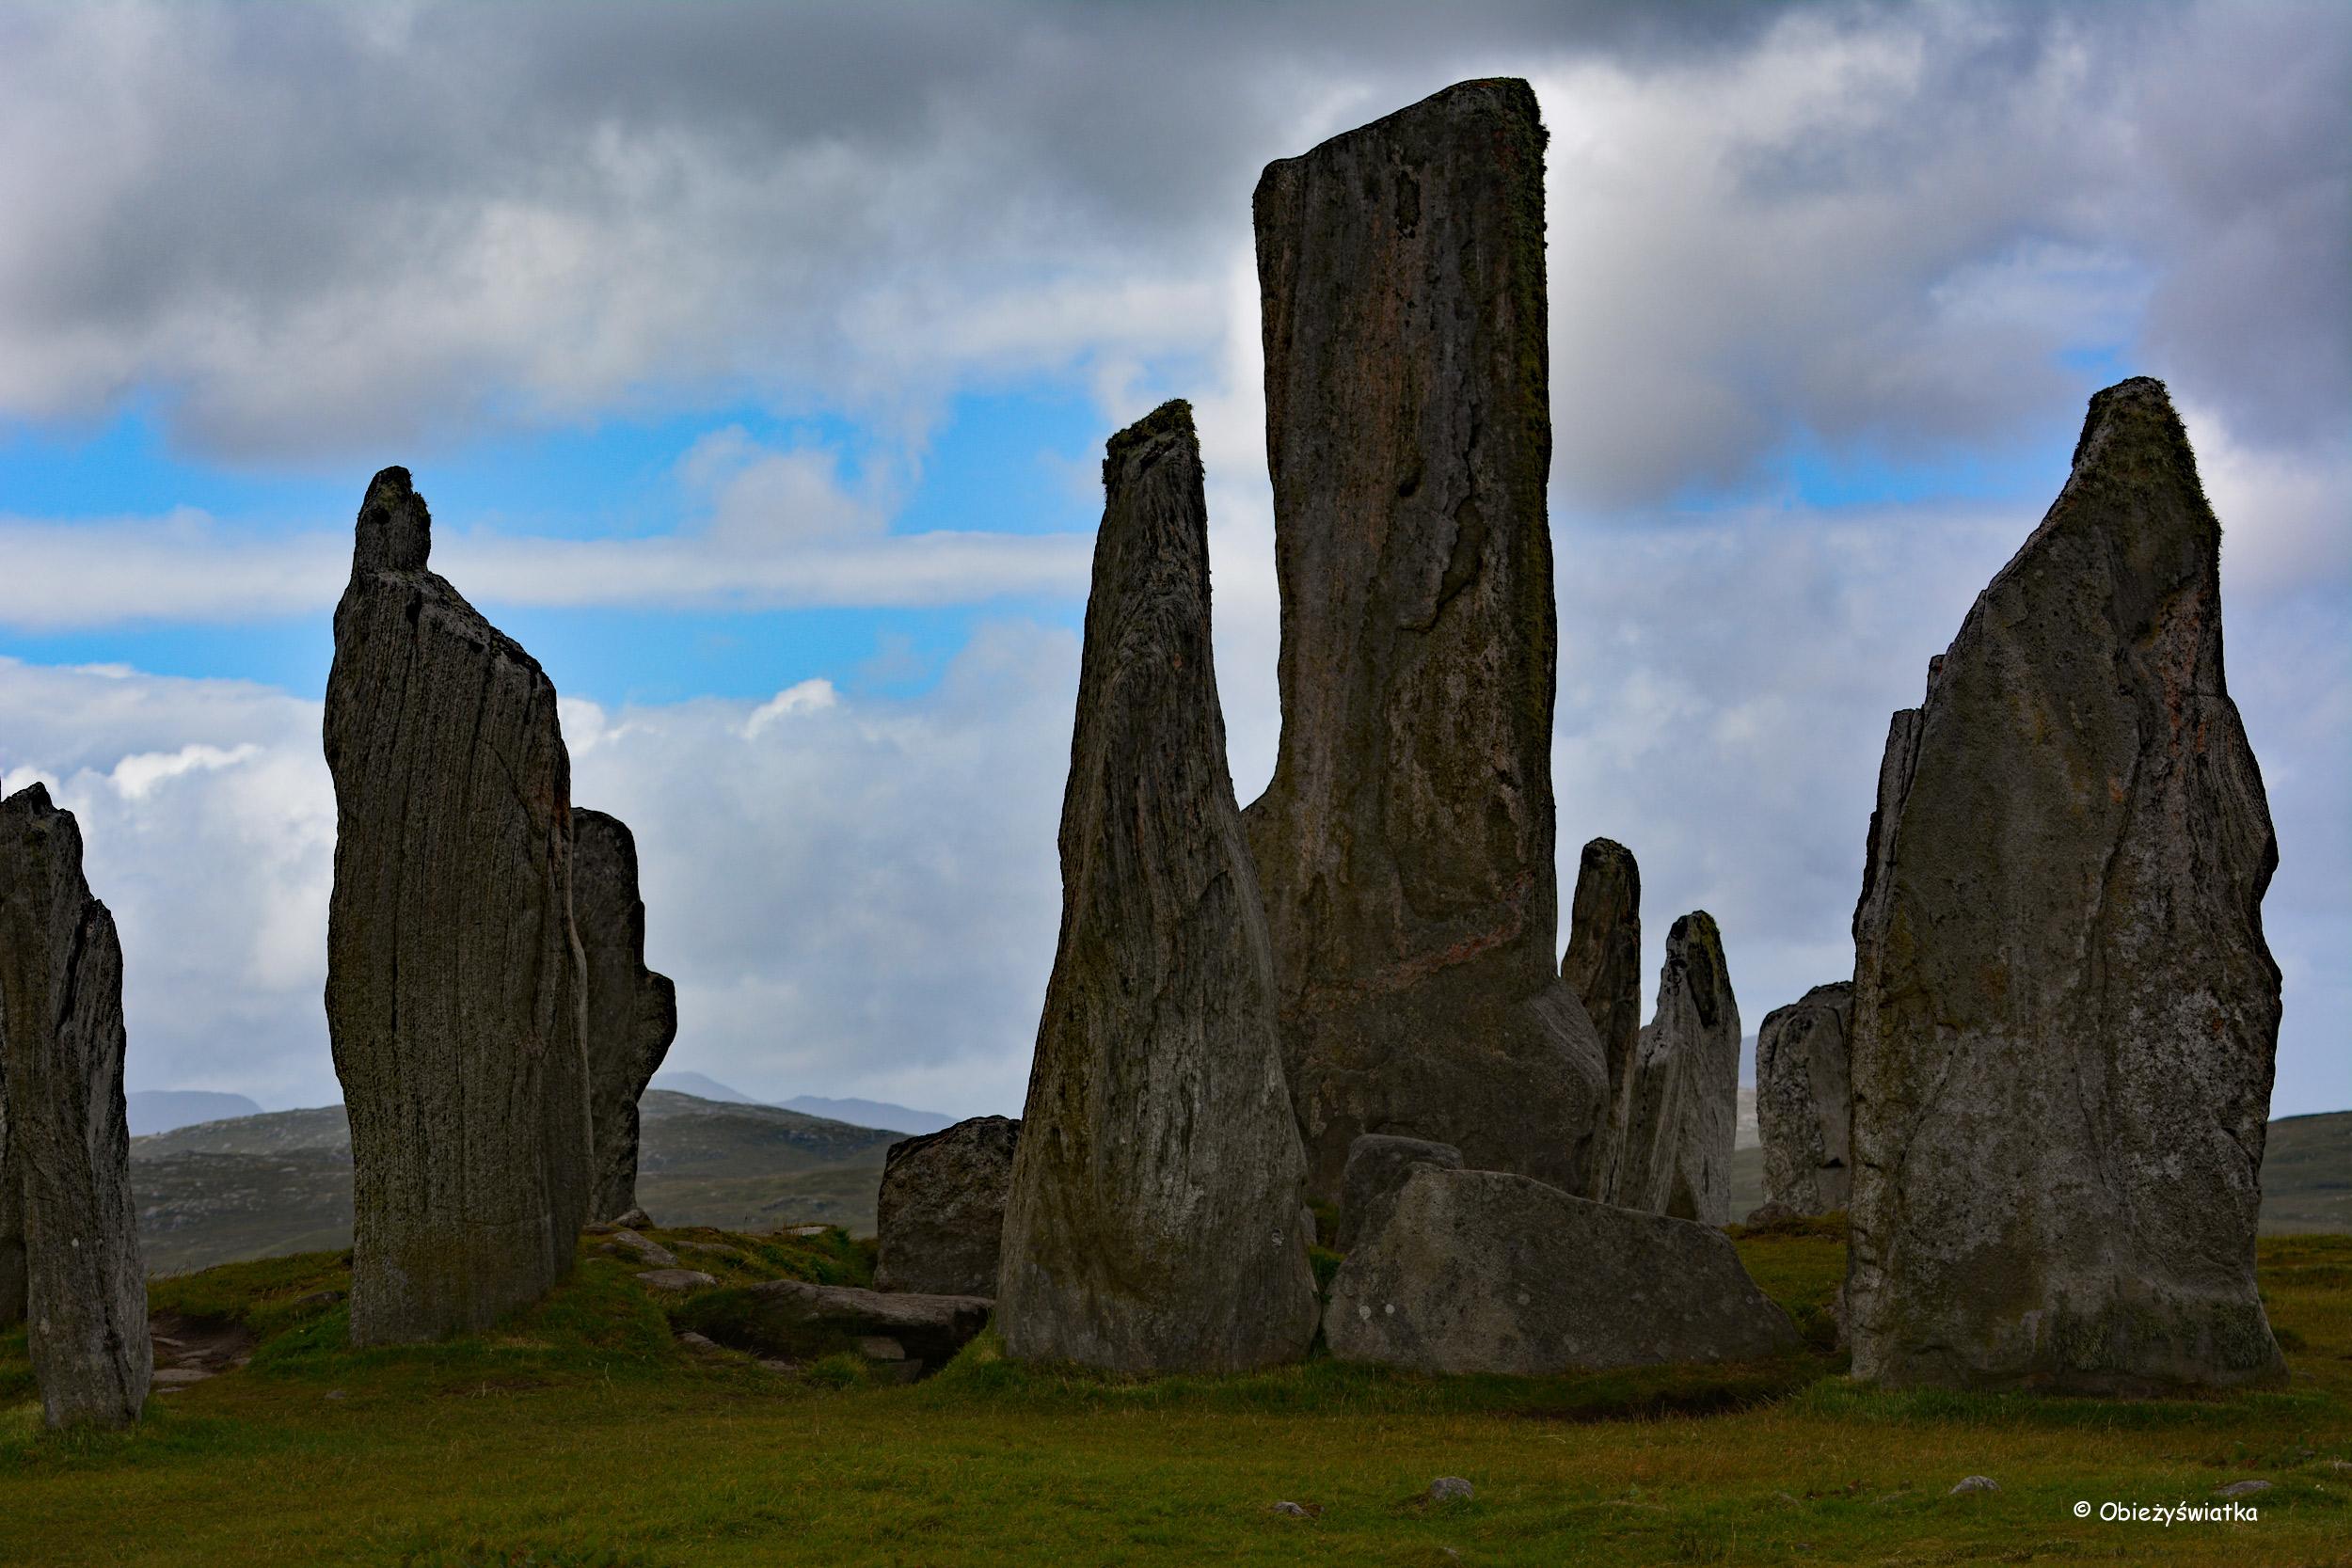 Strażnicy tajemnicy sprzed 4000 lat - Callanish/Calanais, Lewis and Harris